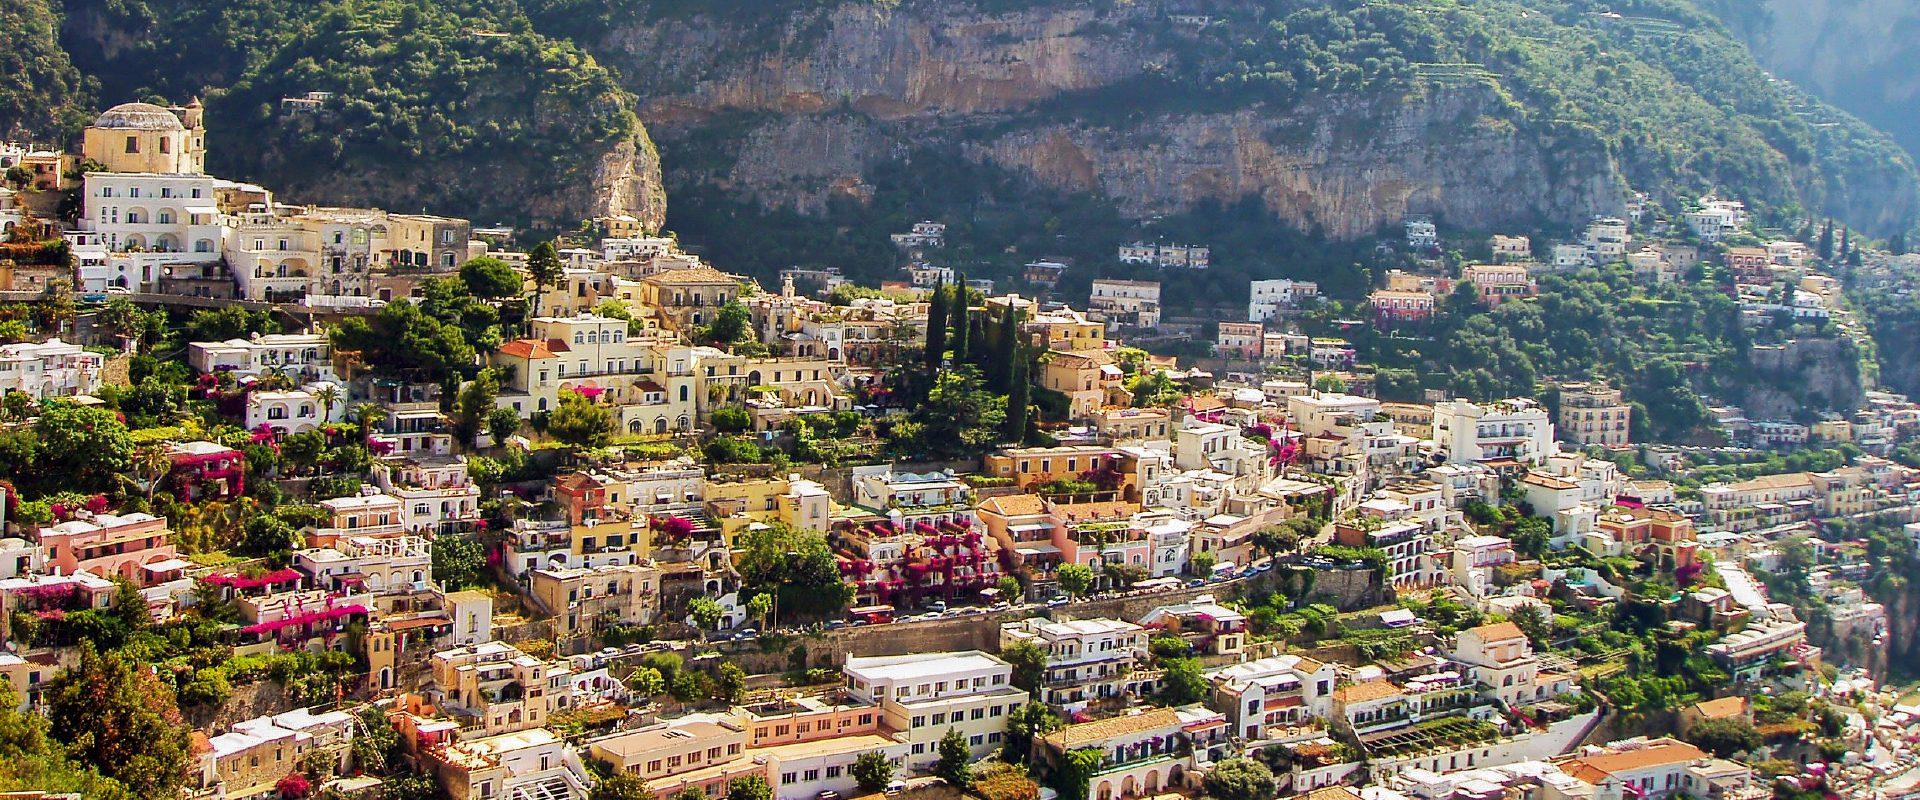 Un viaje por la costa Amalfitana